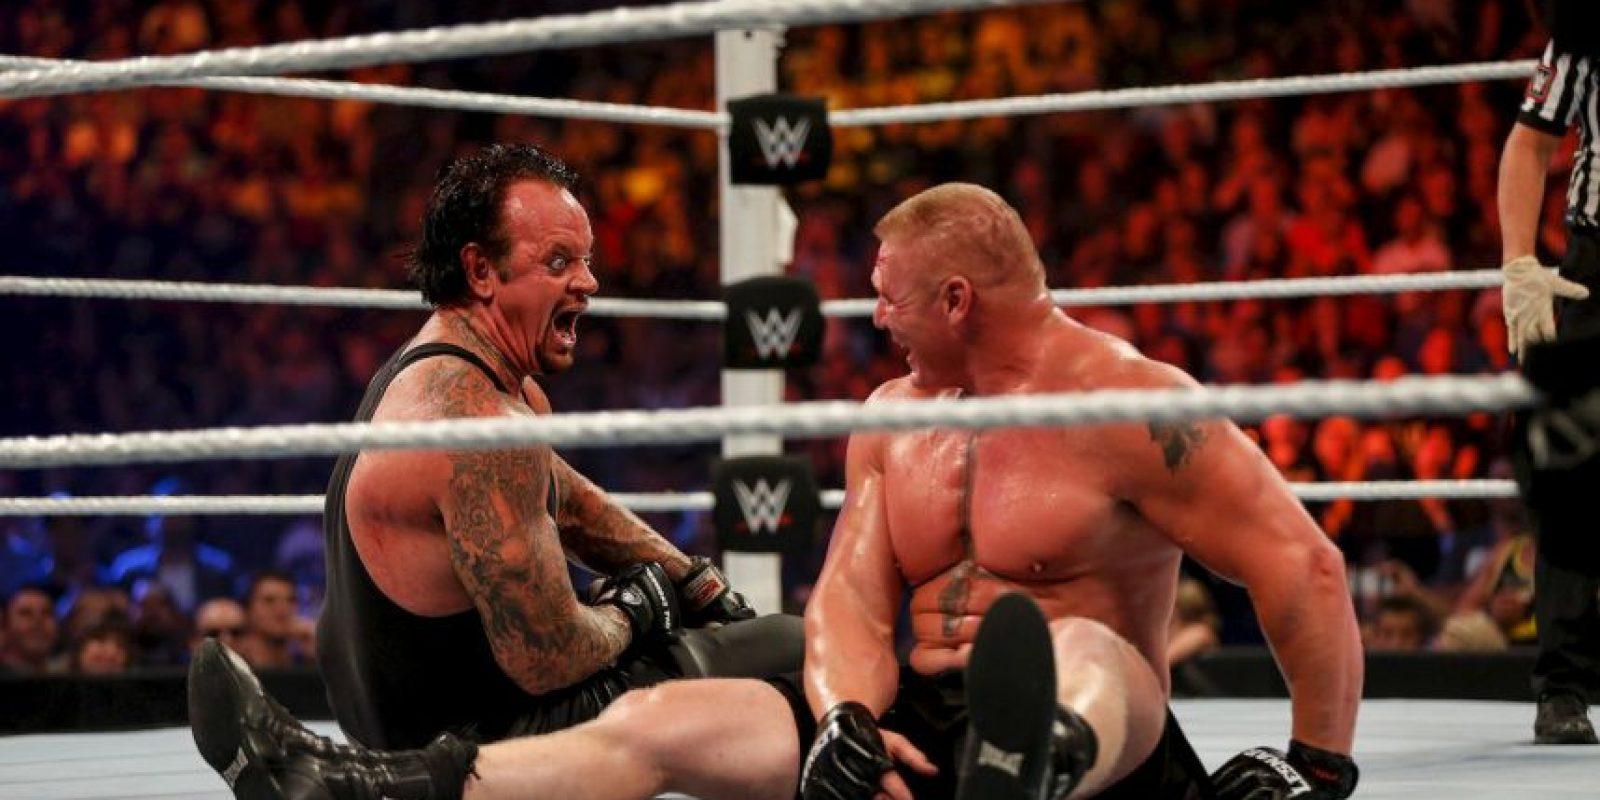 Se espera que Undertaker regrese en Wrestlemania 33 Foto:Getty Images